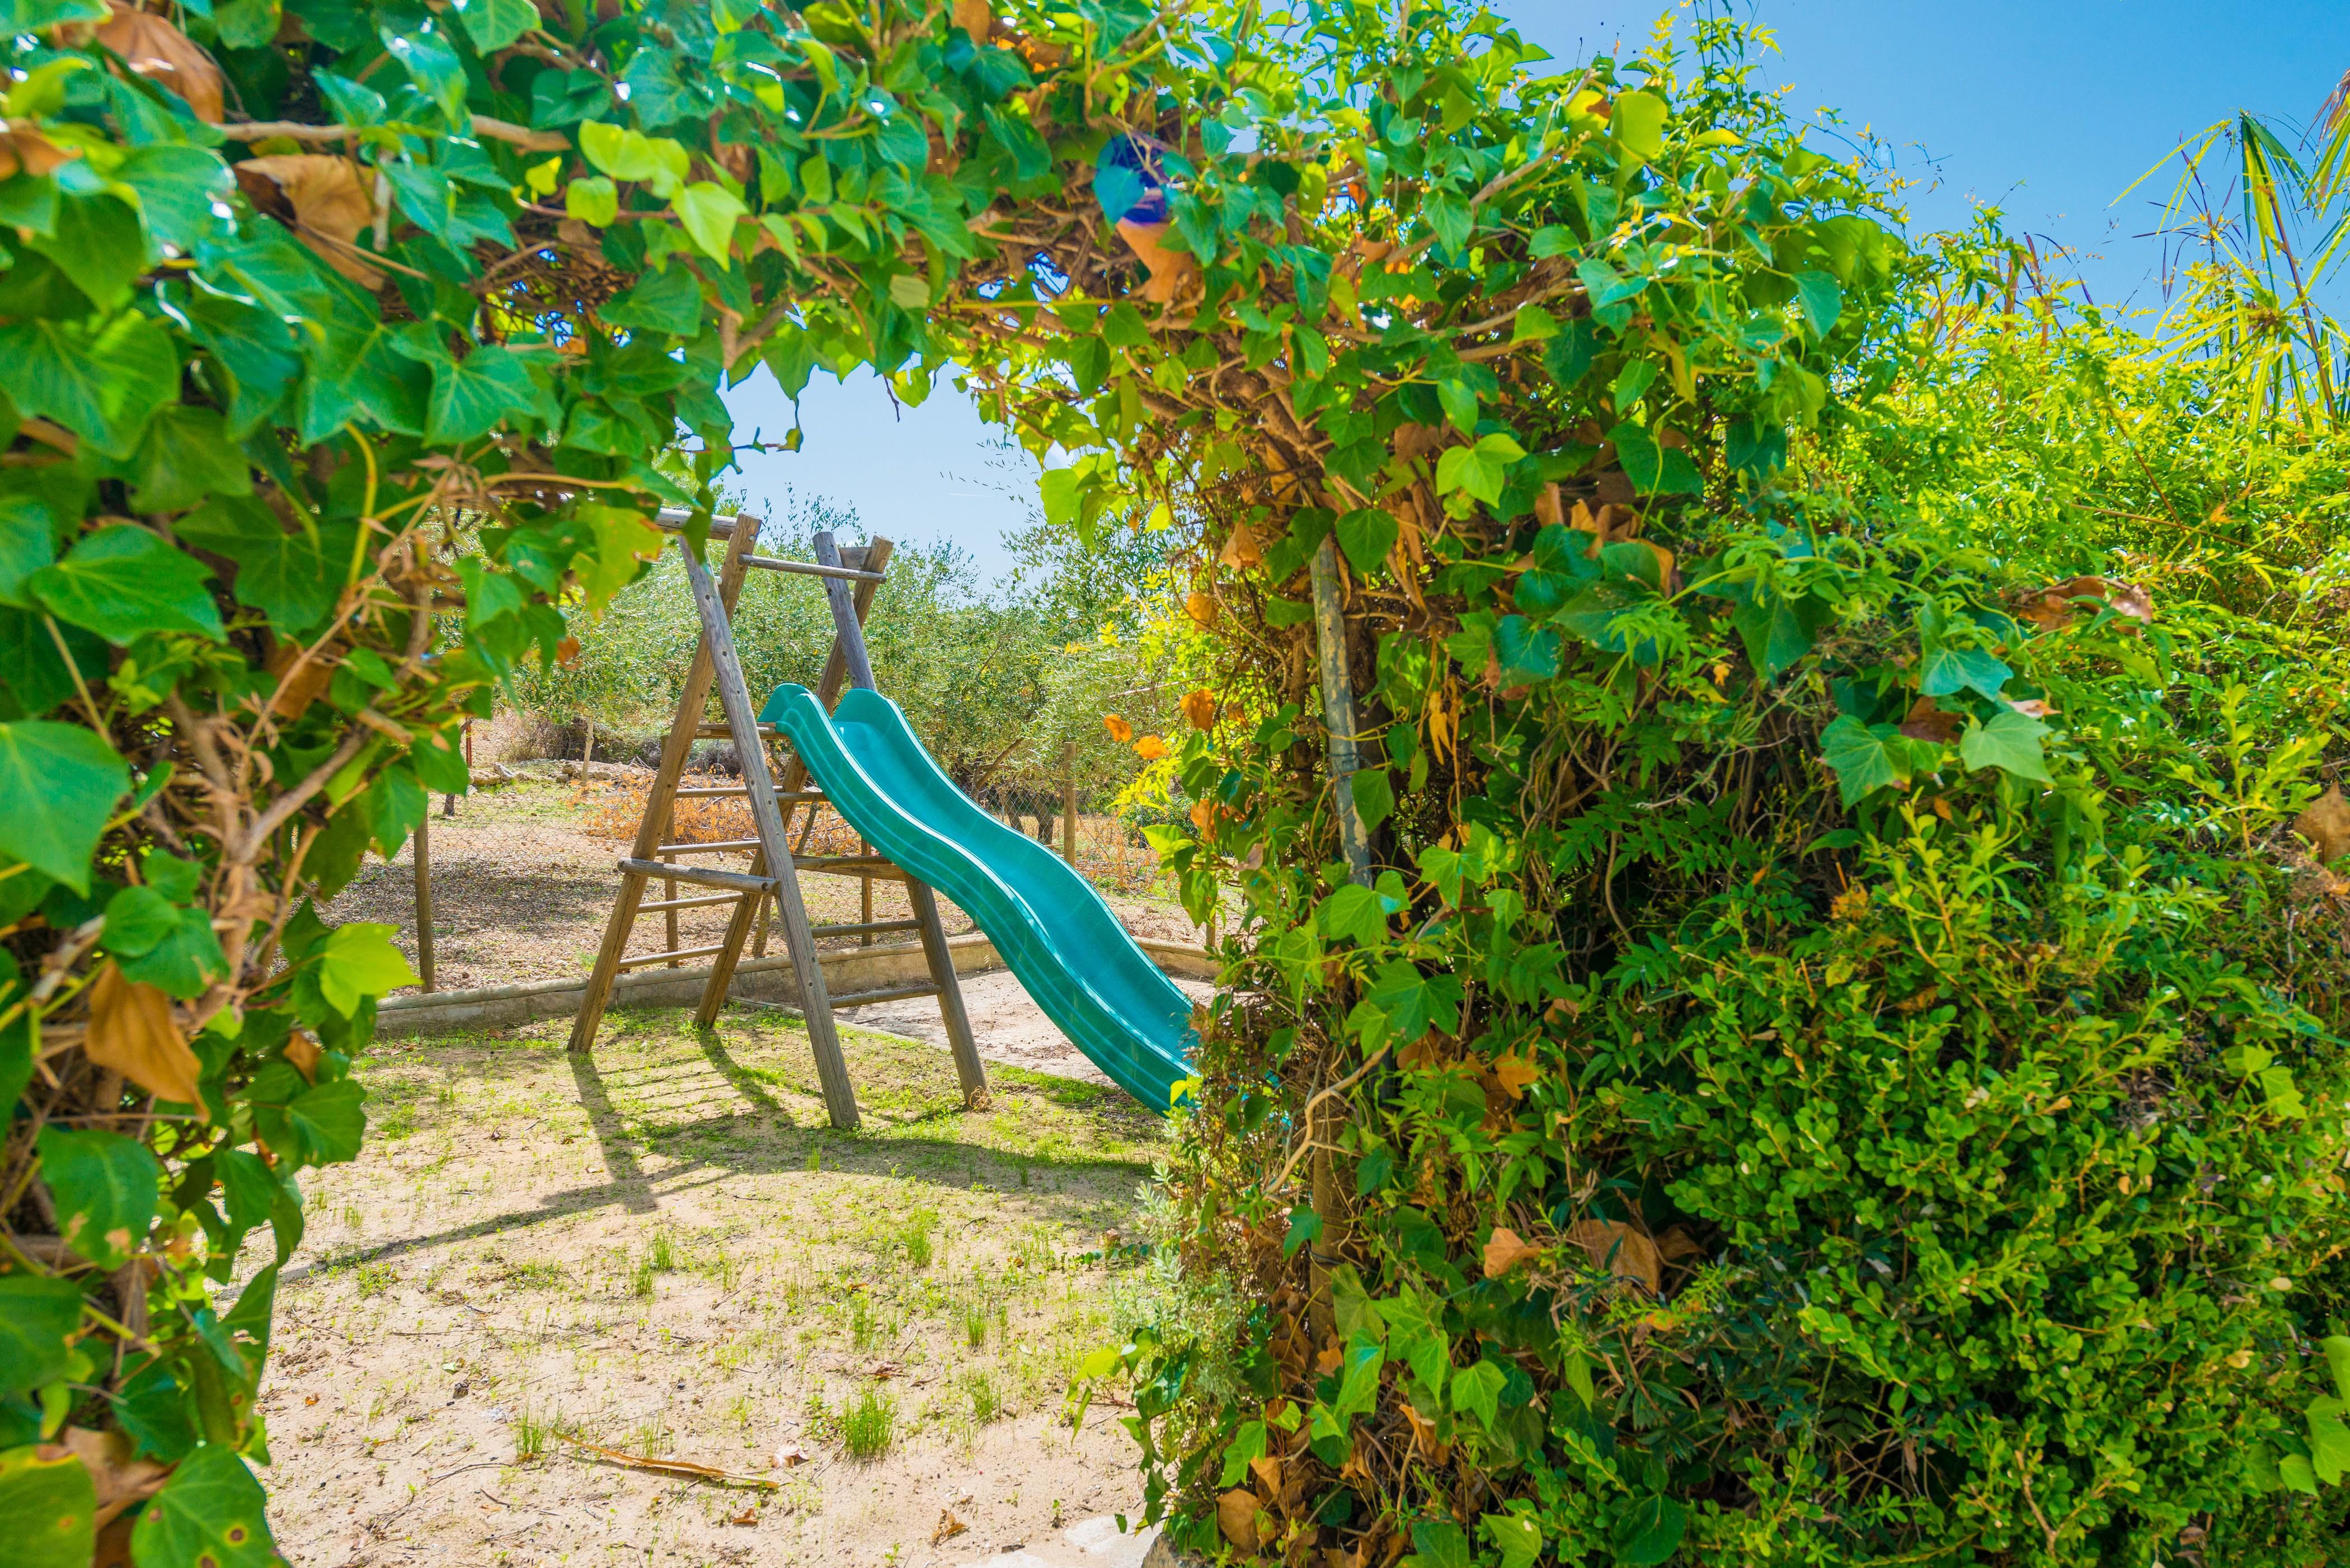 Ferienhaus SON DURINET (2302802), Mancor de la Vall, Mallorca, Balearische Inseln, Spanien, Bild 28